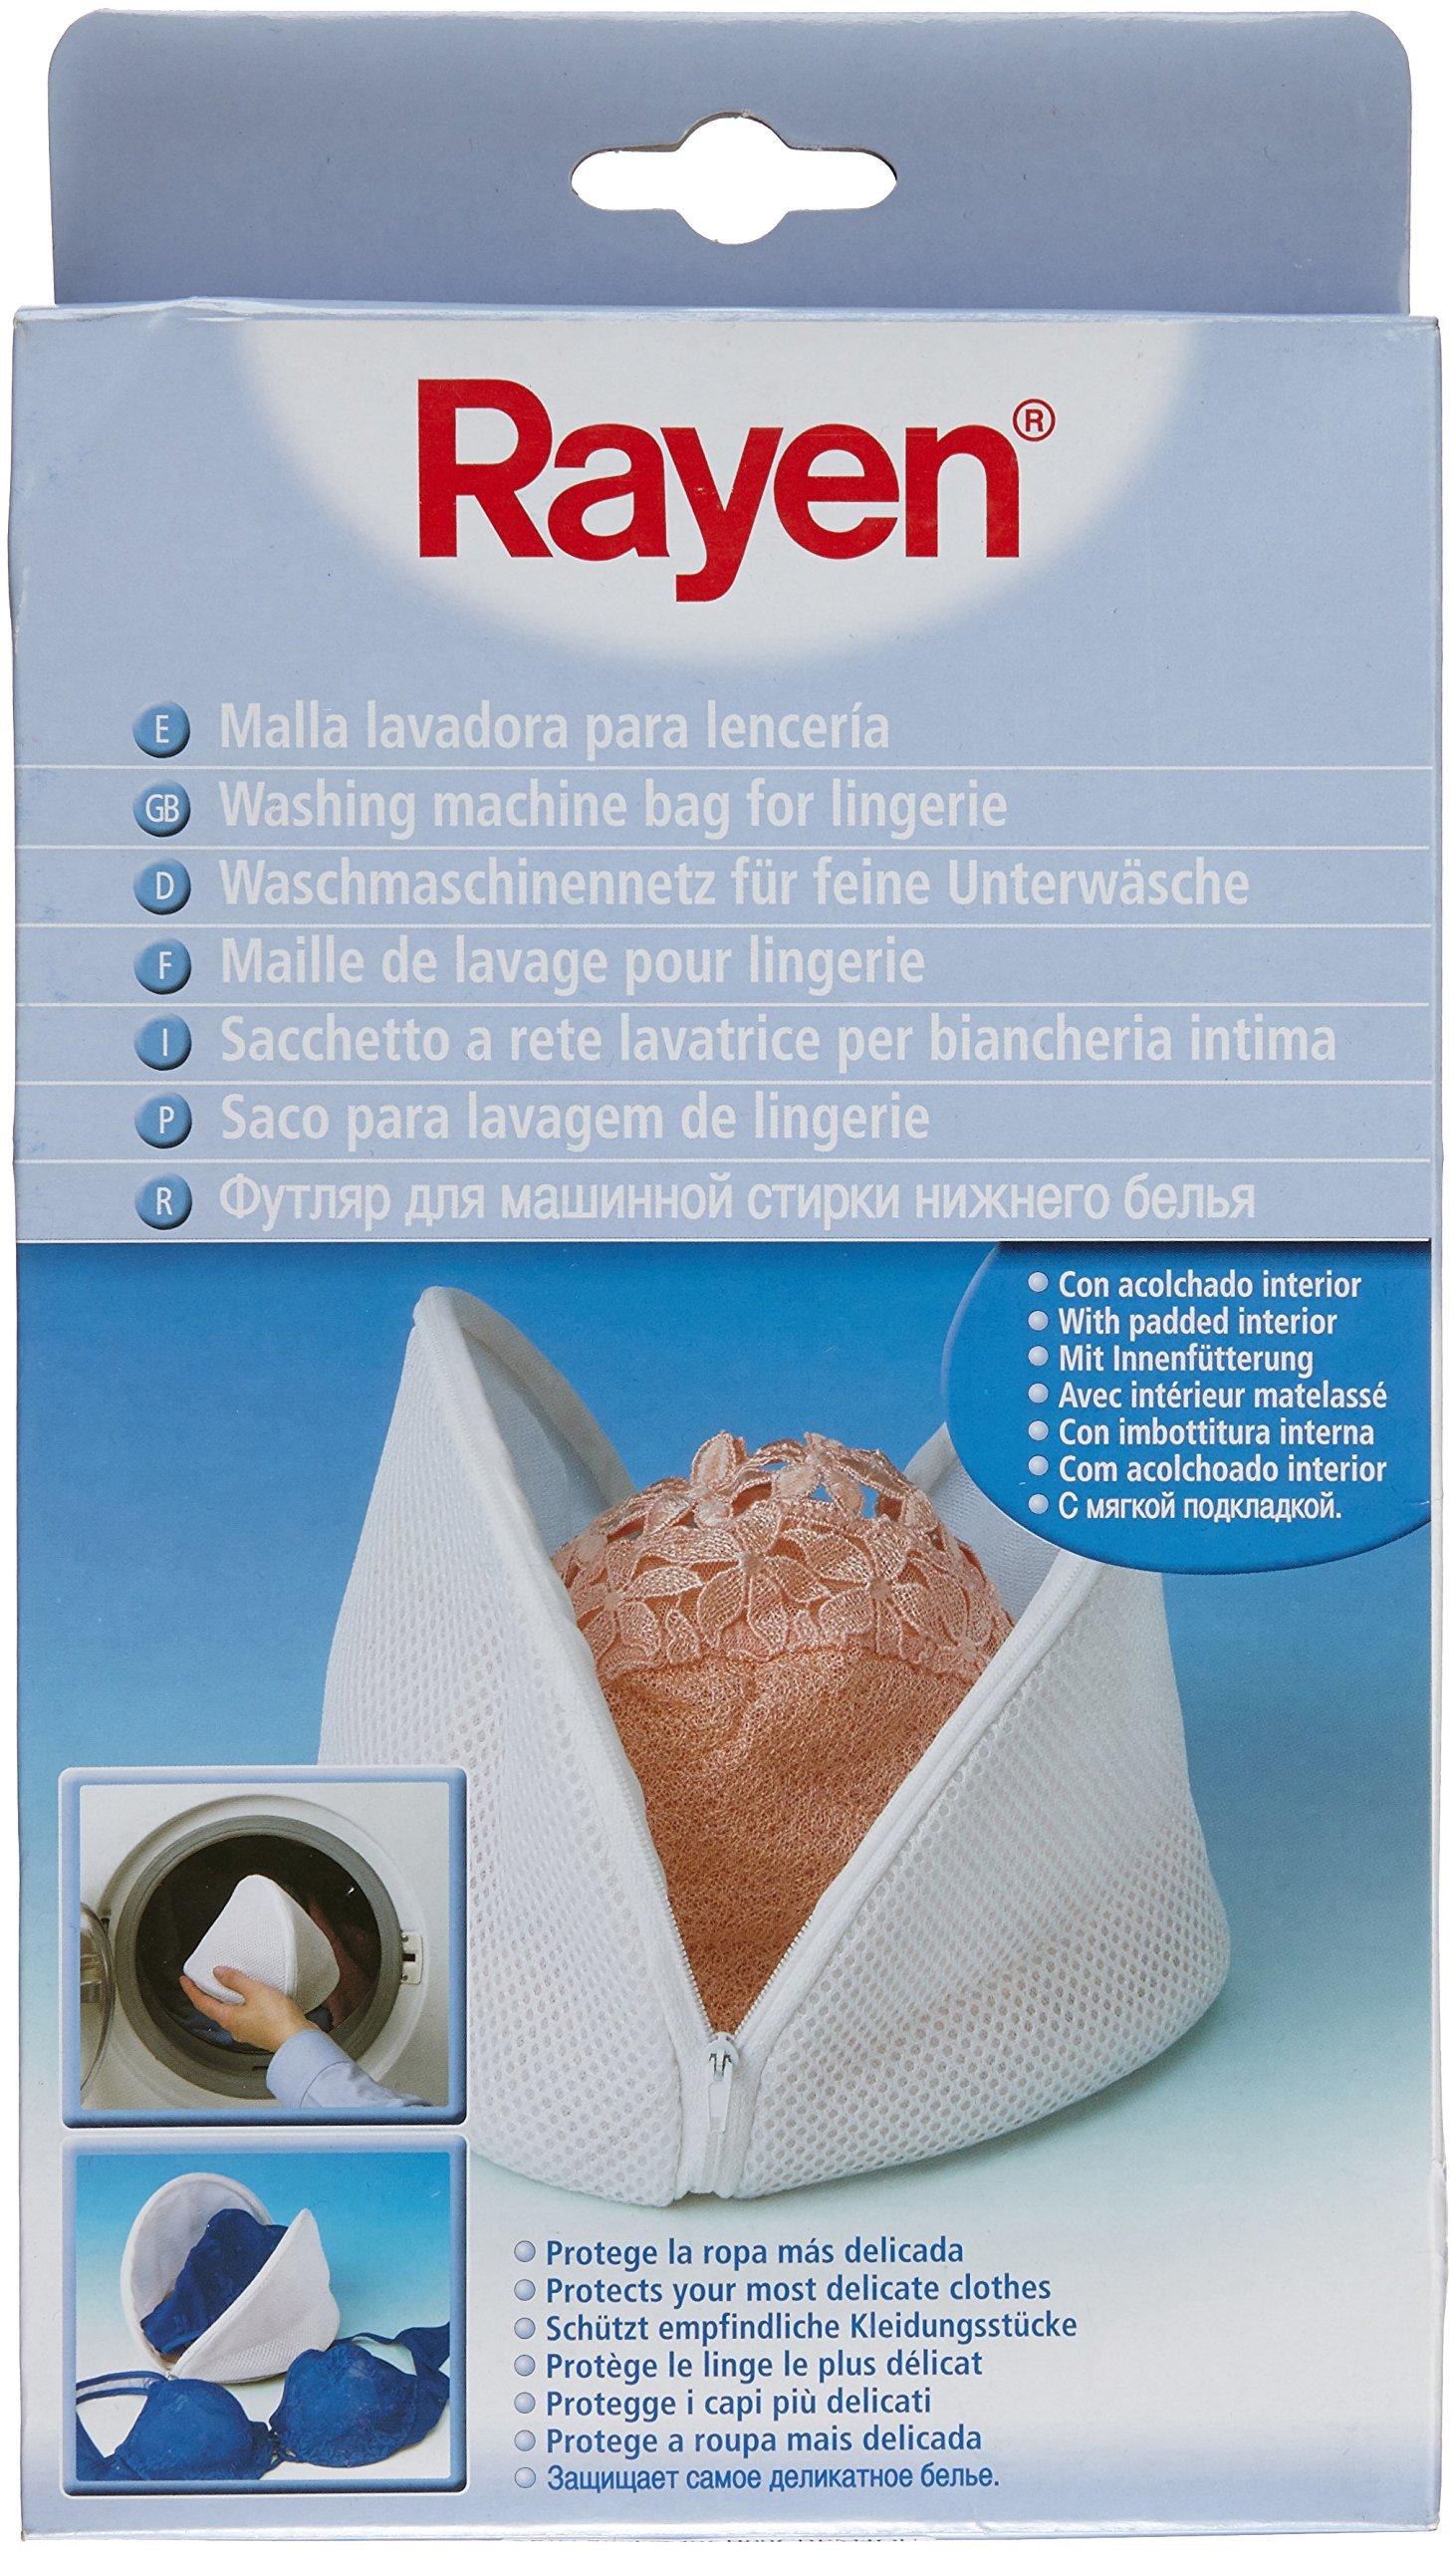 Rayen 6391 - Malla lavadora lenceria, funda para ropa delicada, color blanco product image